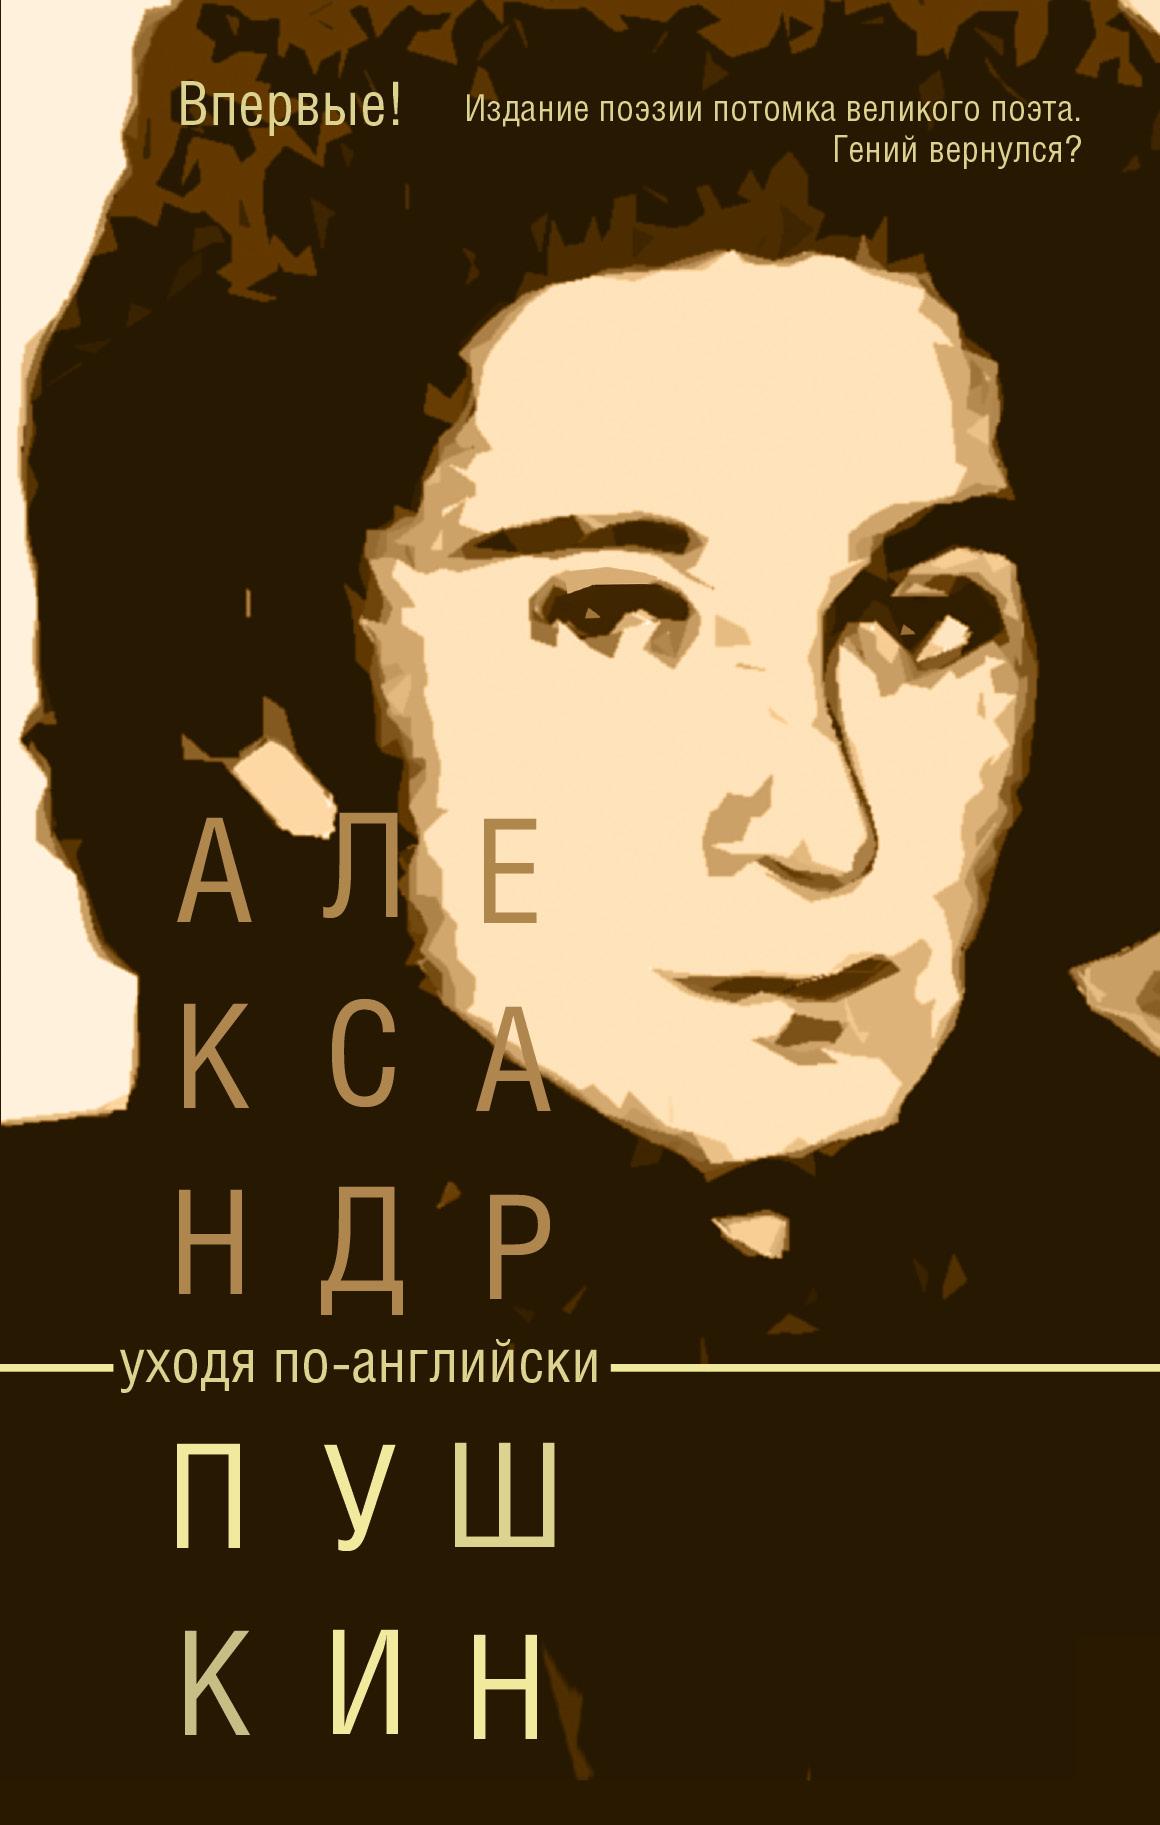 Уходя по-английски ( Пушкин Александр  )